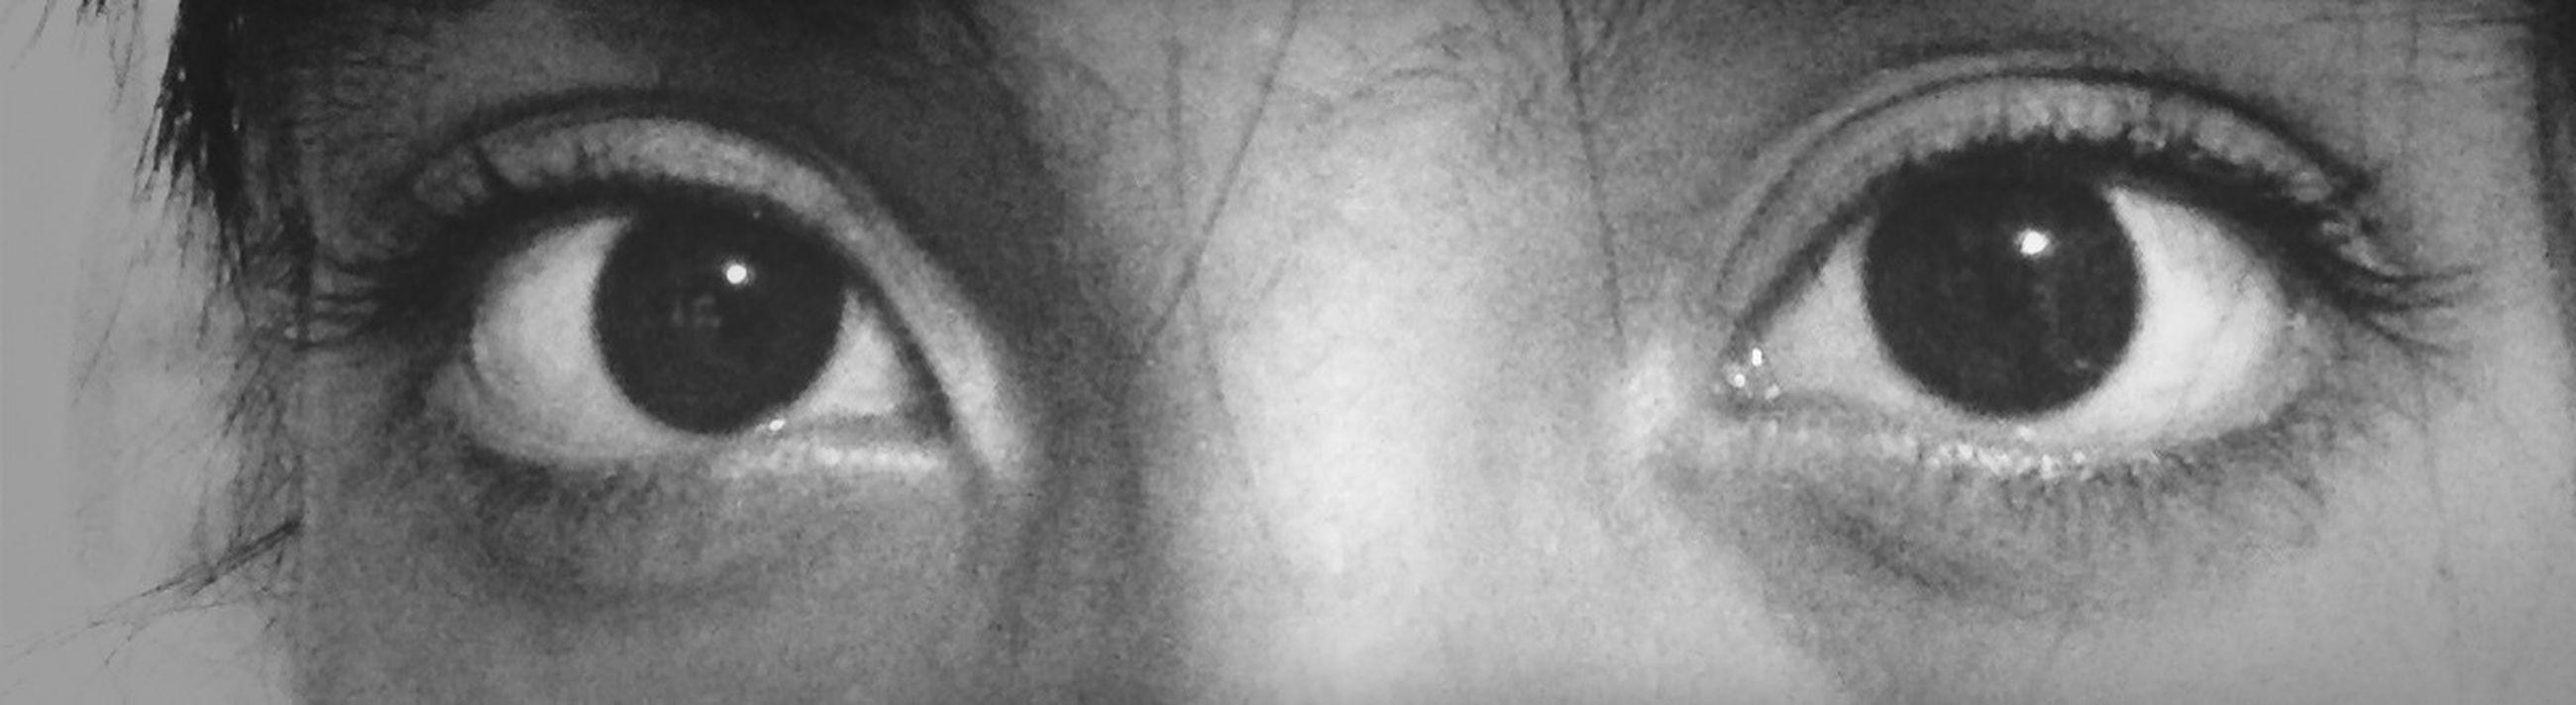 human eye, close-up, human face, looking at camera, headshot, portrait, indoors, eyelash, part of, eyesight, lifestyles, human skin, young adult, sensory perception, extreme close-up, extreme close up, eyebrow